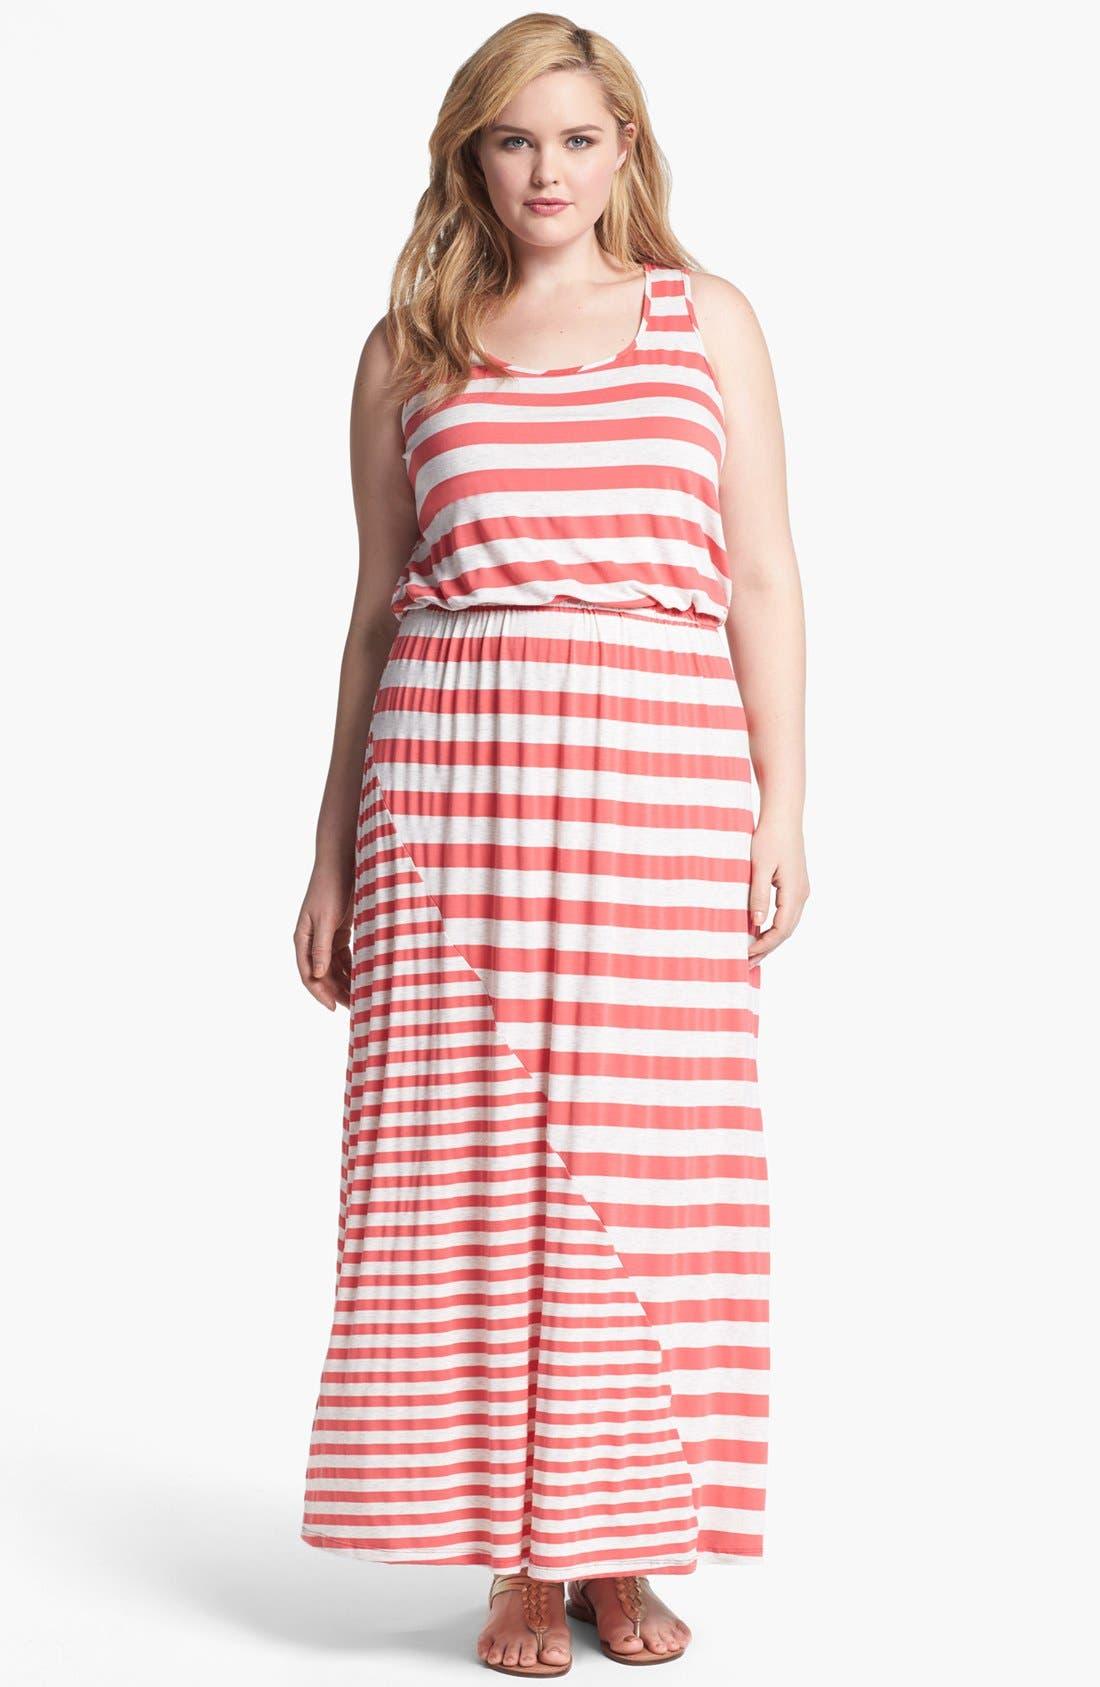 Alternate Image 1 Selected - Olivia Moon Stripe Jersey Maxi Dress (Plus Size)